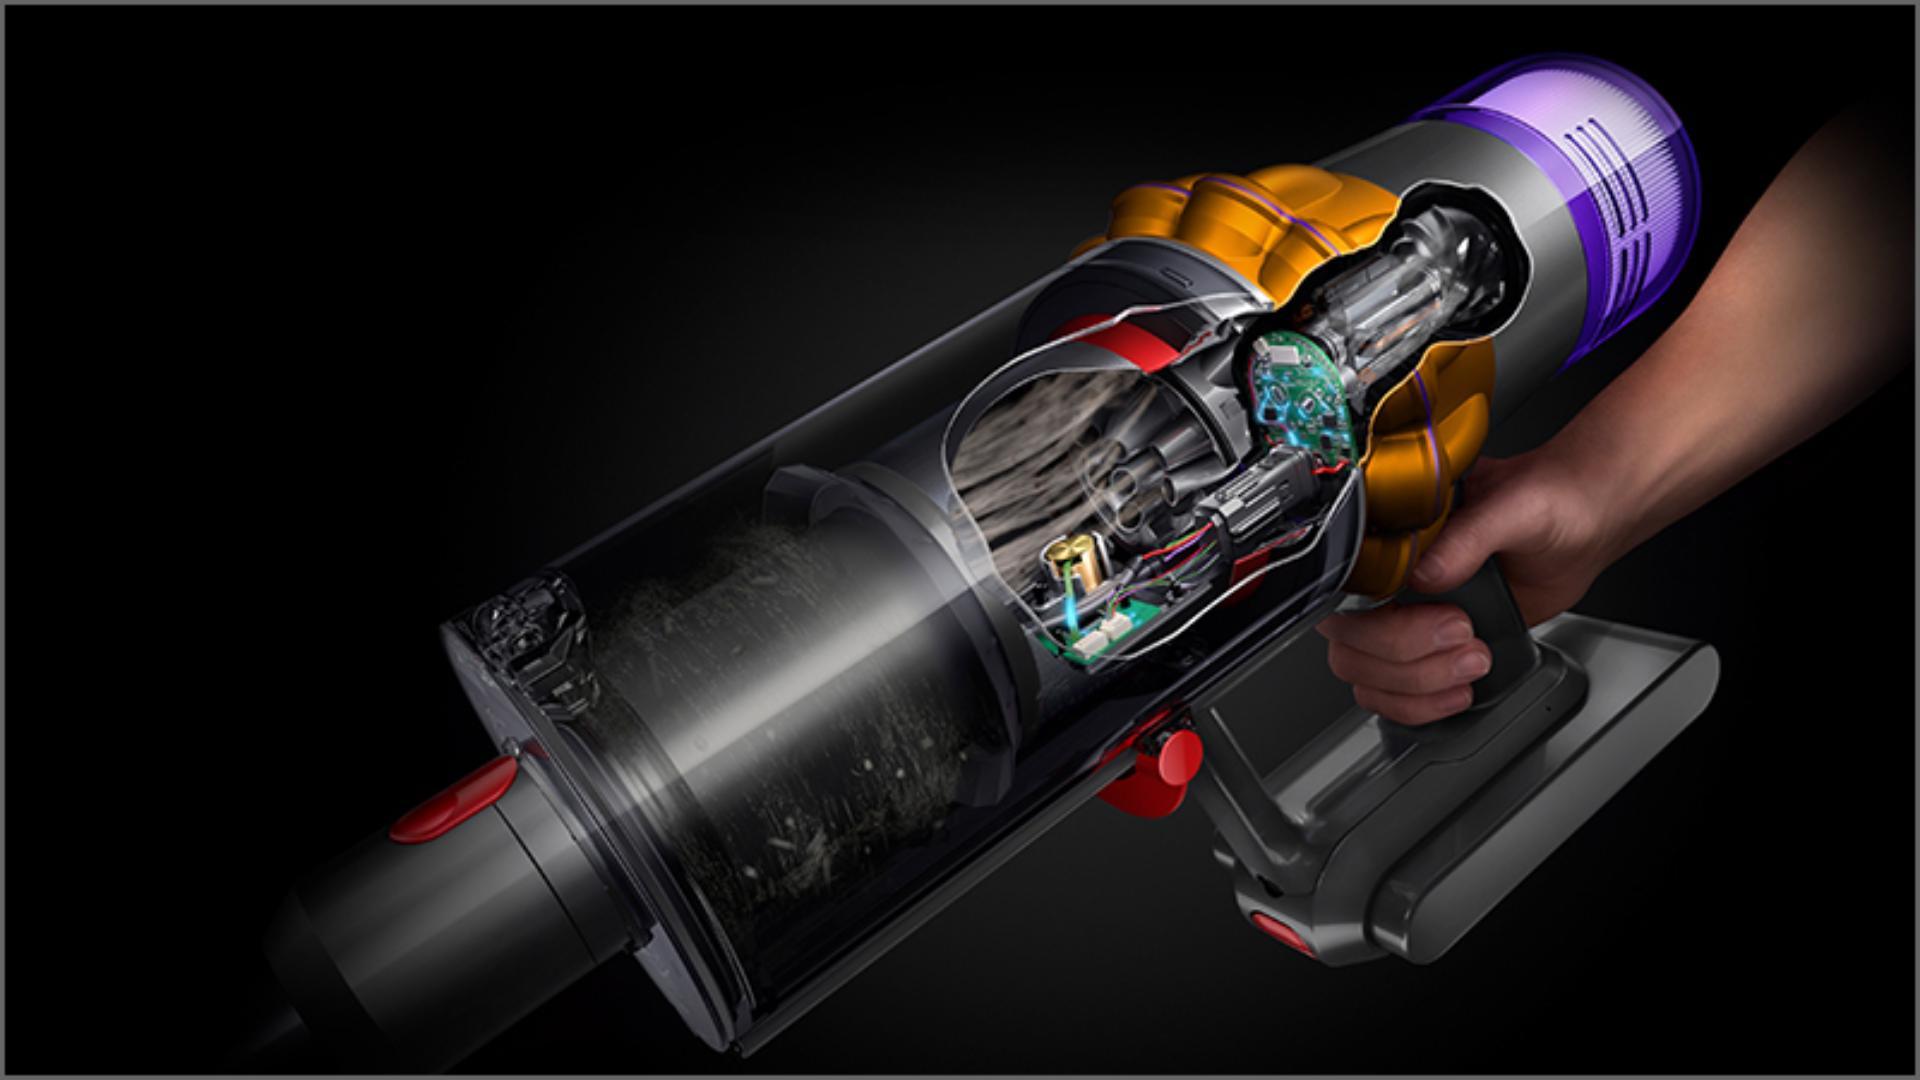 X-ray shot of inside of technology inside Dyson vacuum